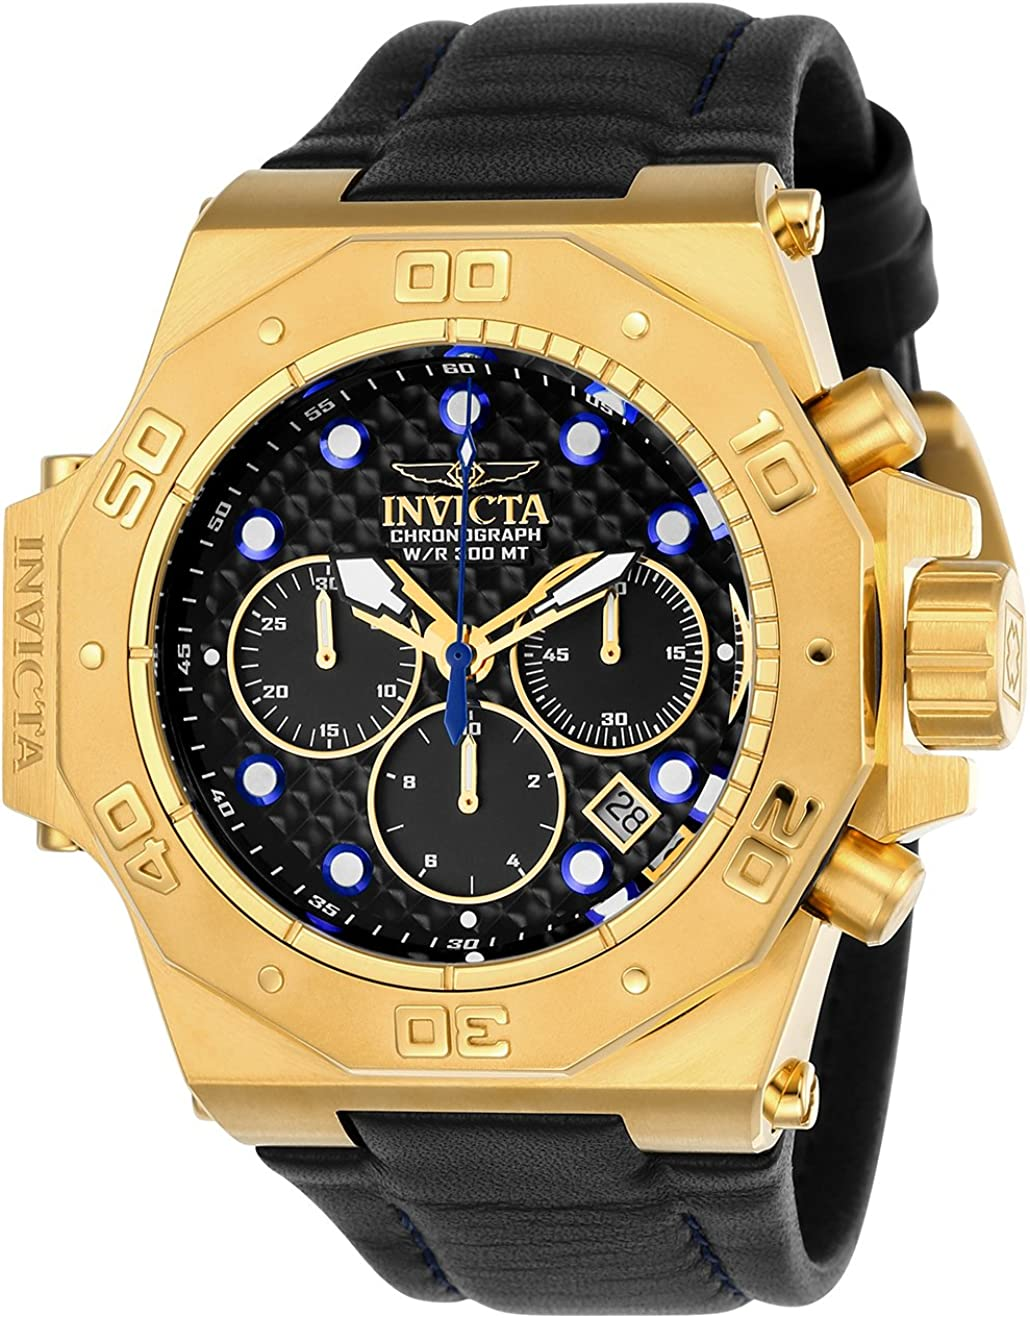 Invicta Men s Akula Quartz Watch with Leather Calfskin Strap, Black, 32 Model 23103